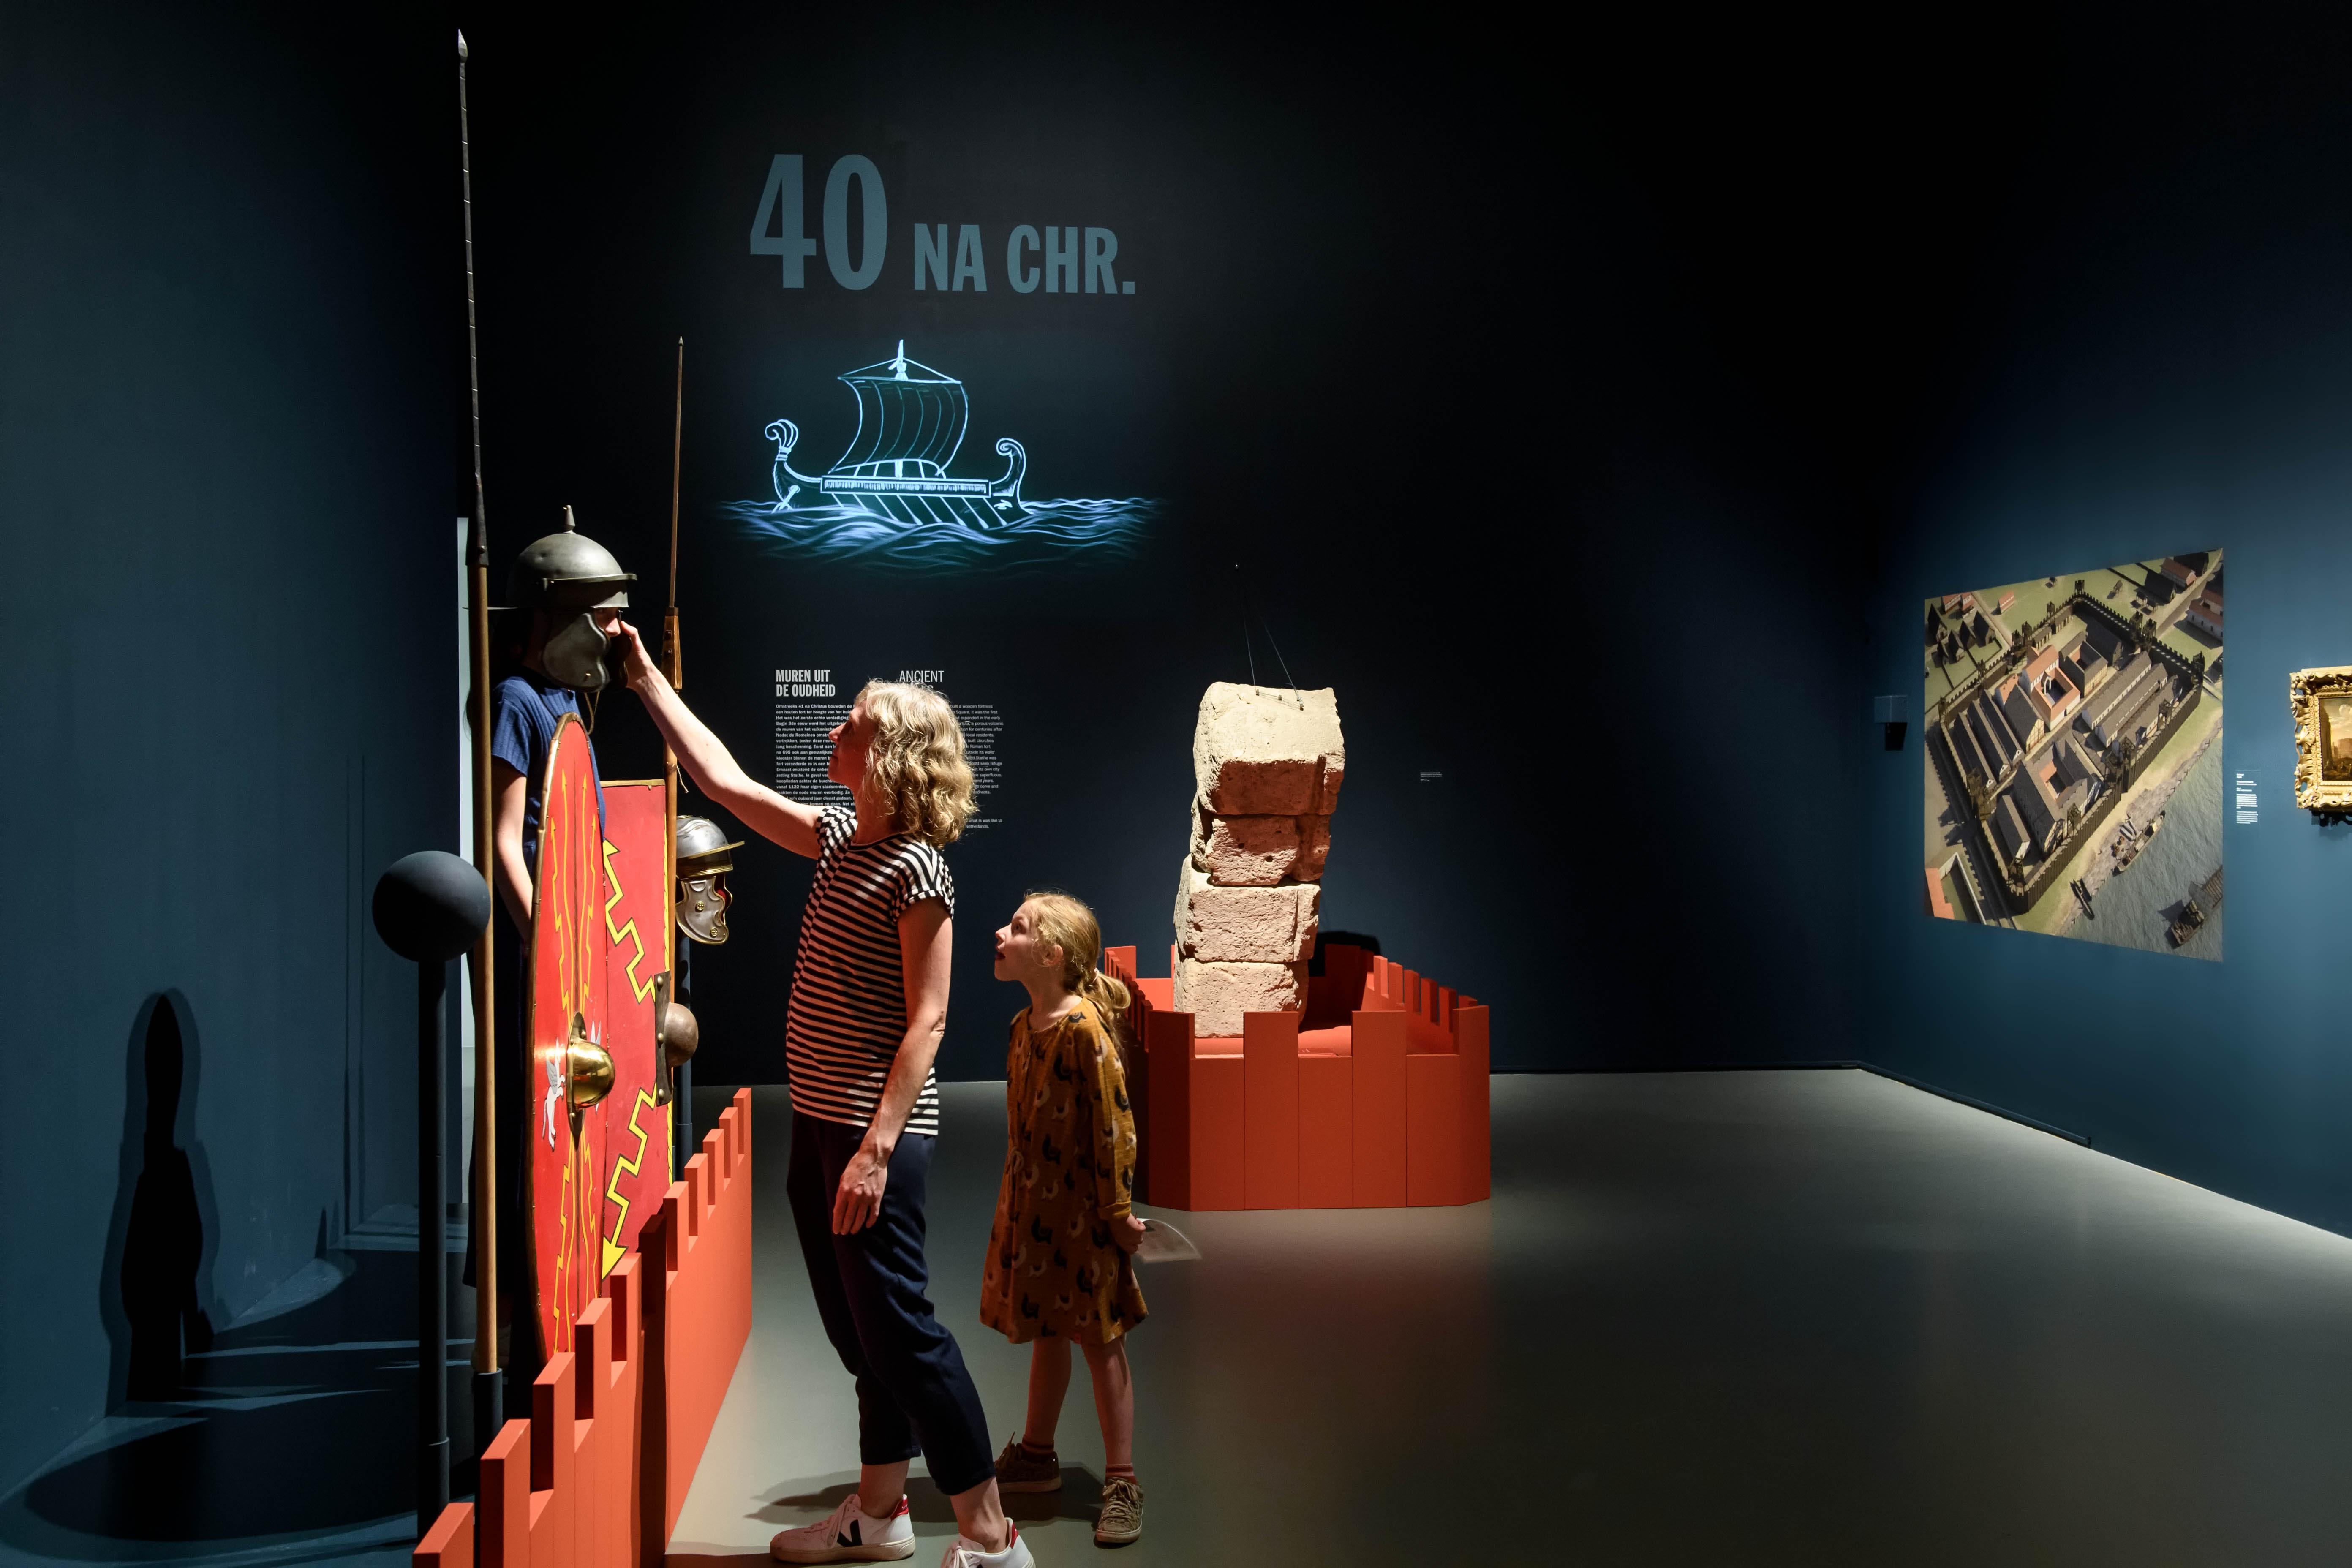 tentoonstelling de ommuurde stad centraal museum 1 2 jpg